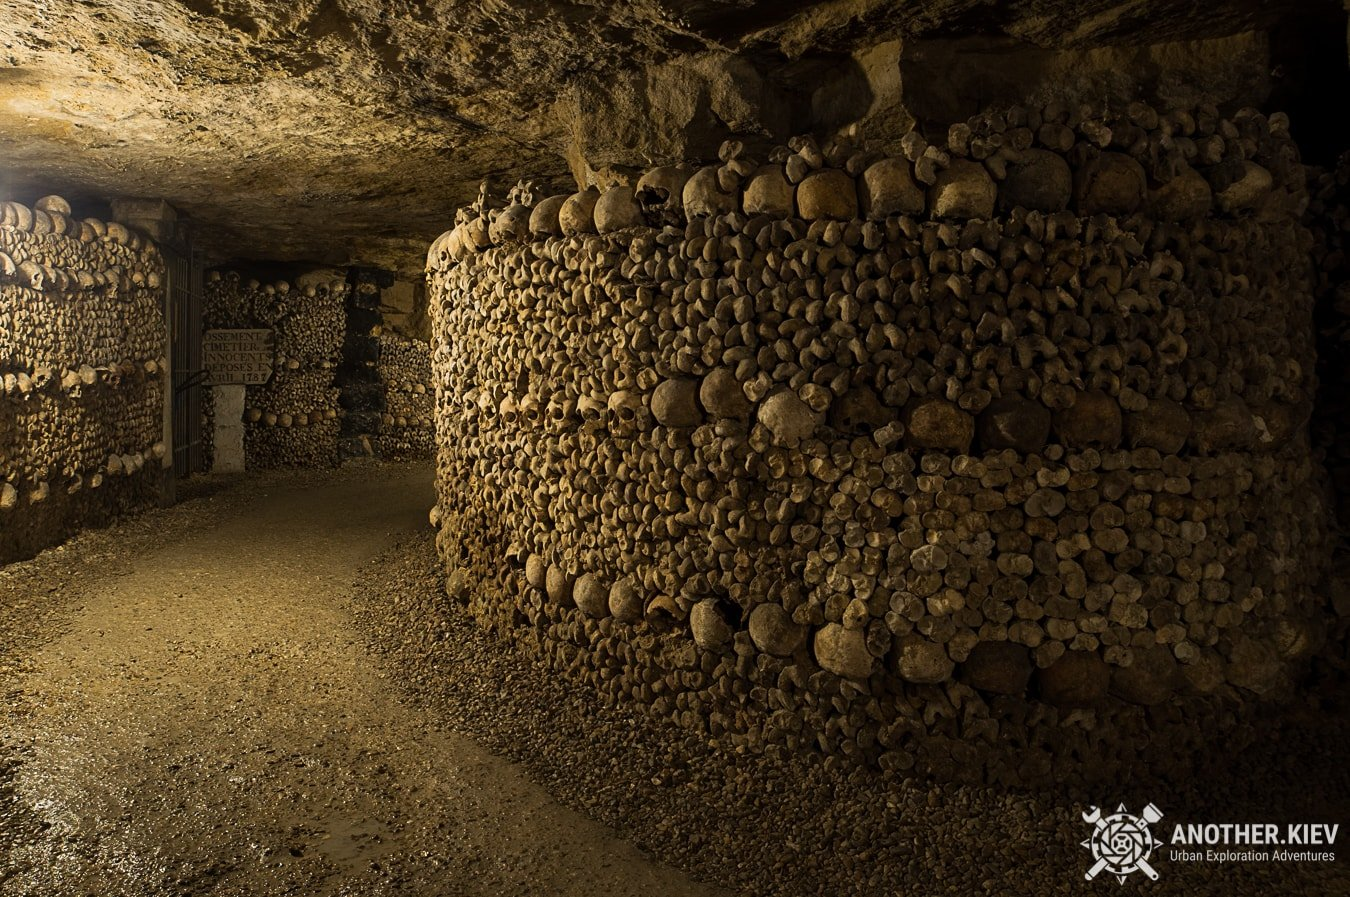 paris-catacombs-dark-urbex-tour-4 PARIS CATACOMBS DARK TOUR